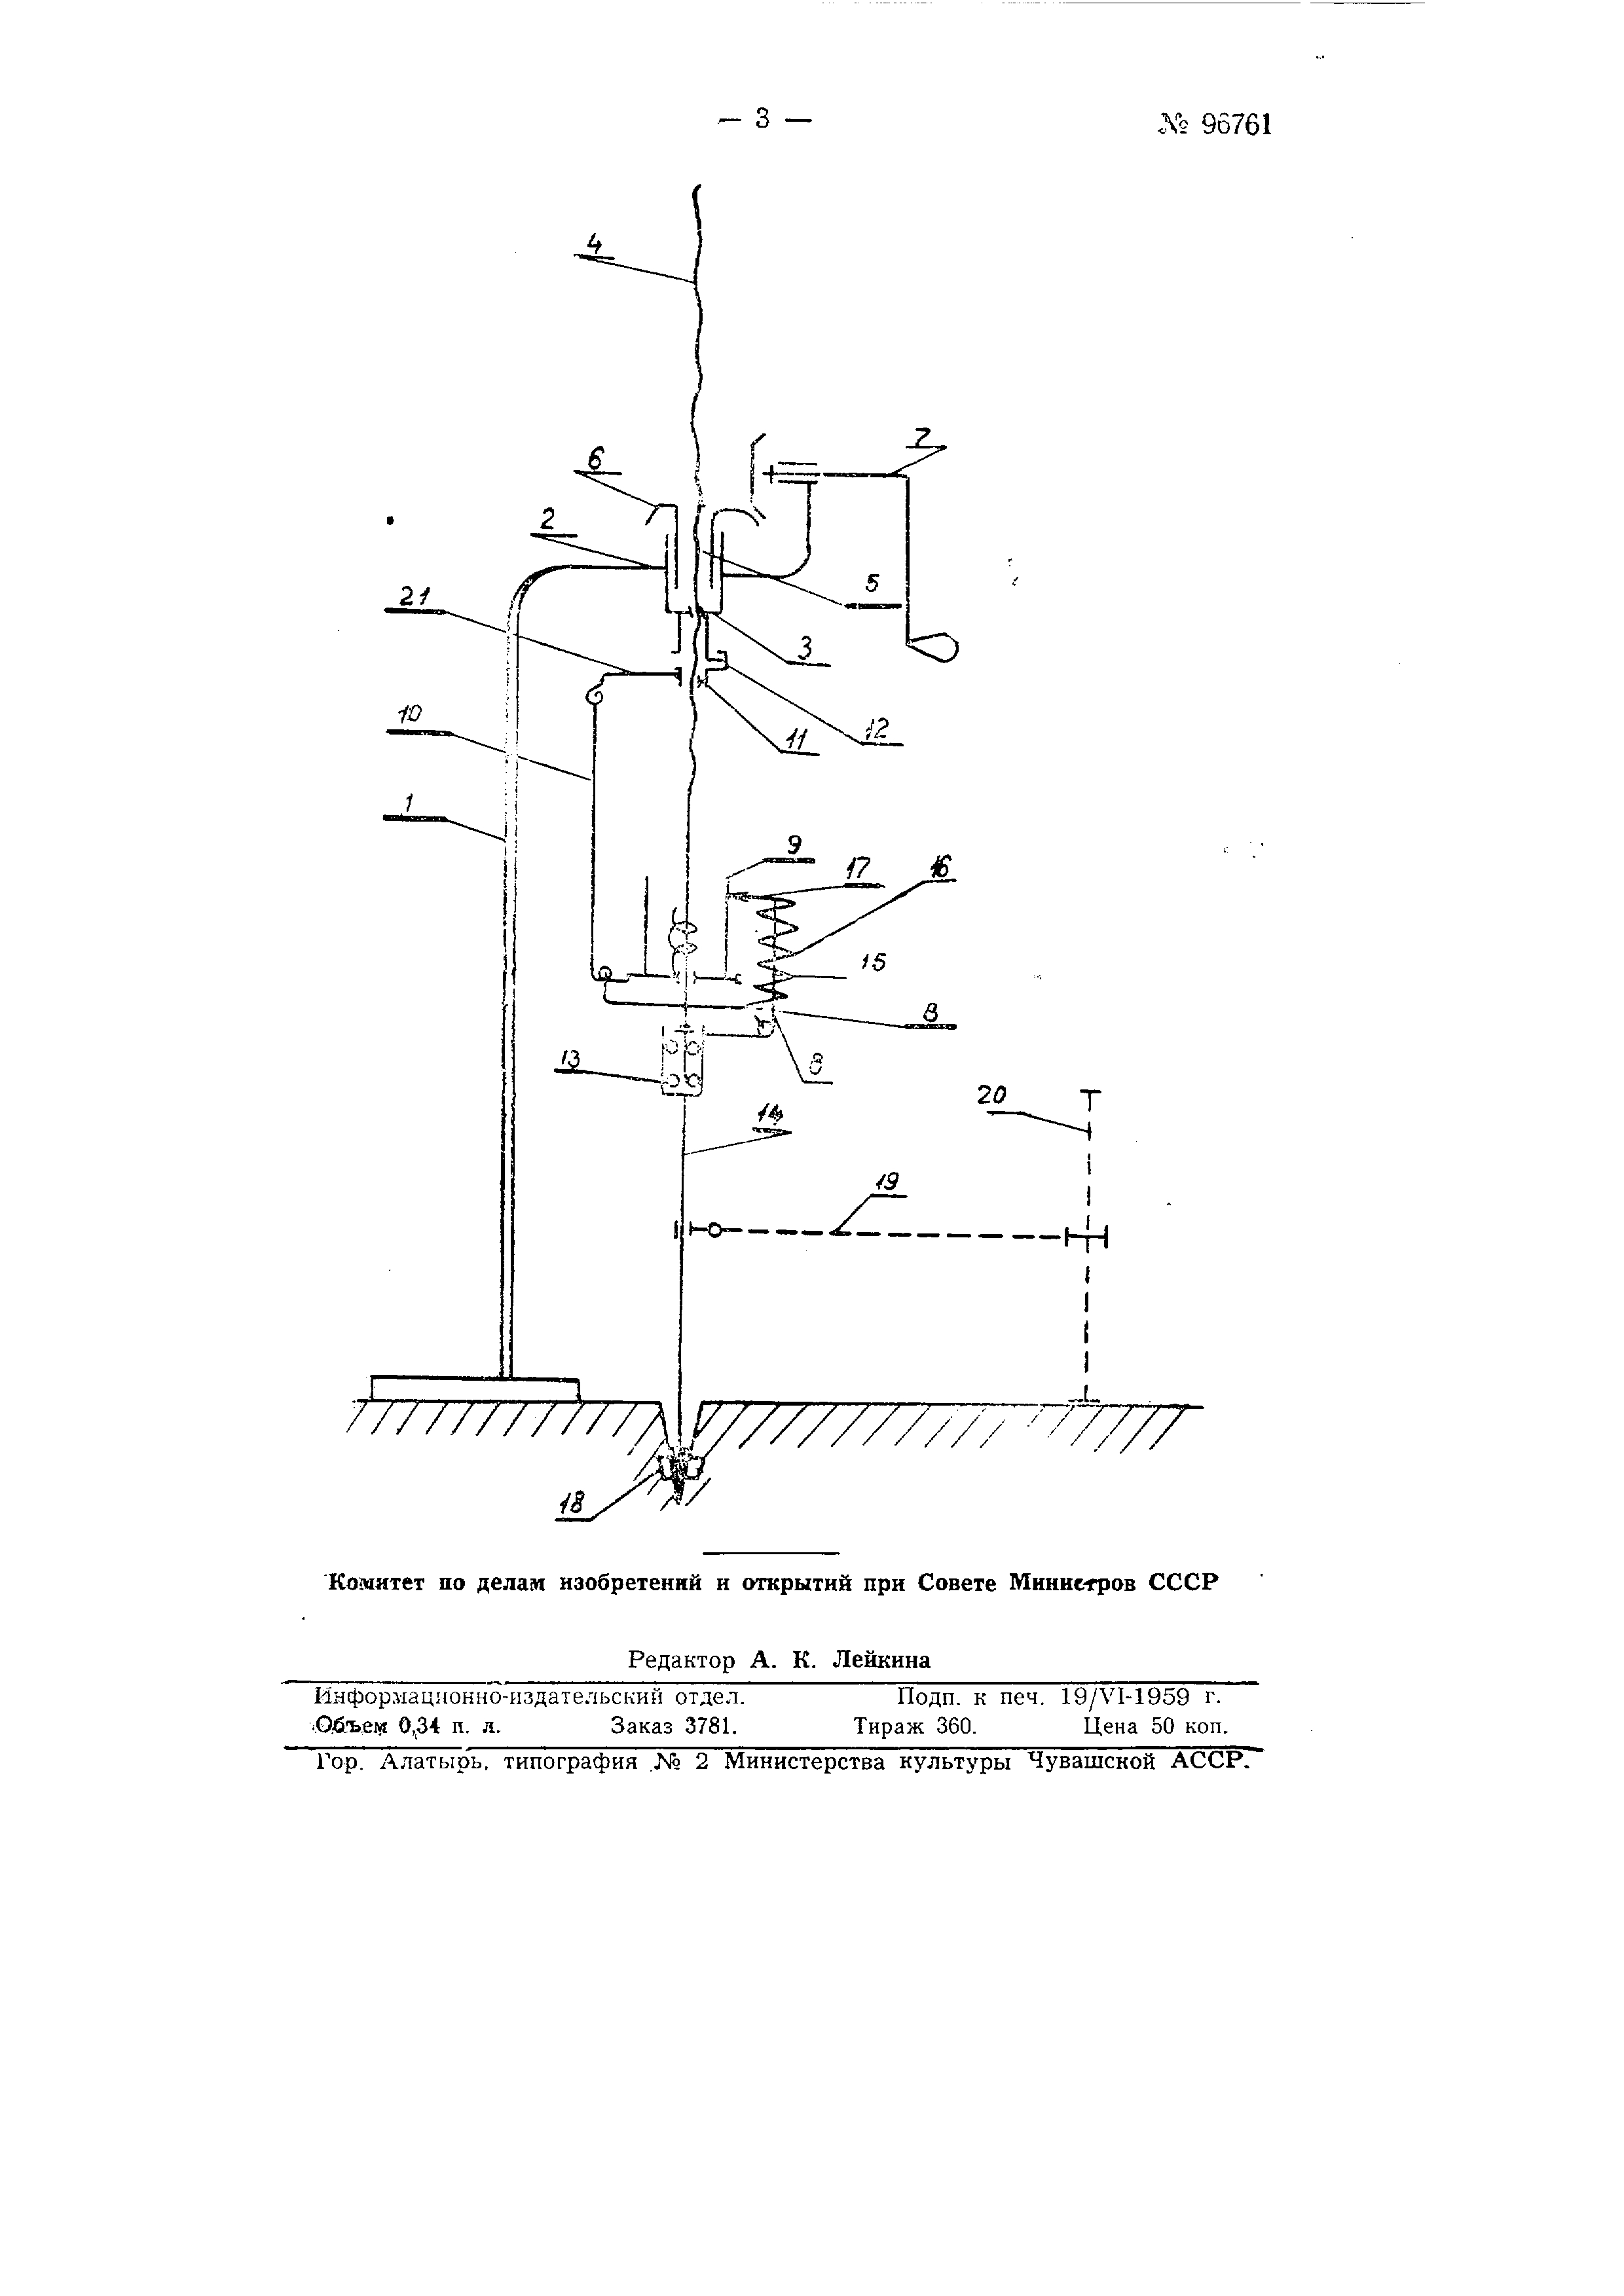 Плотномеры схемы